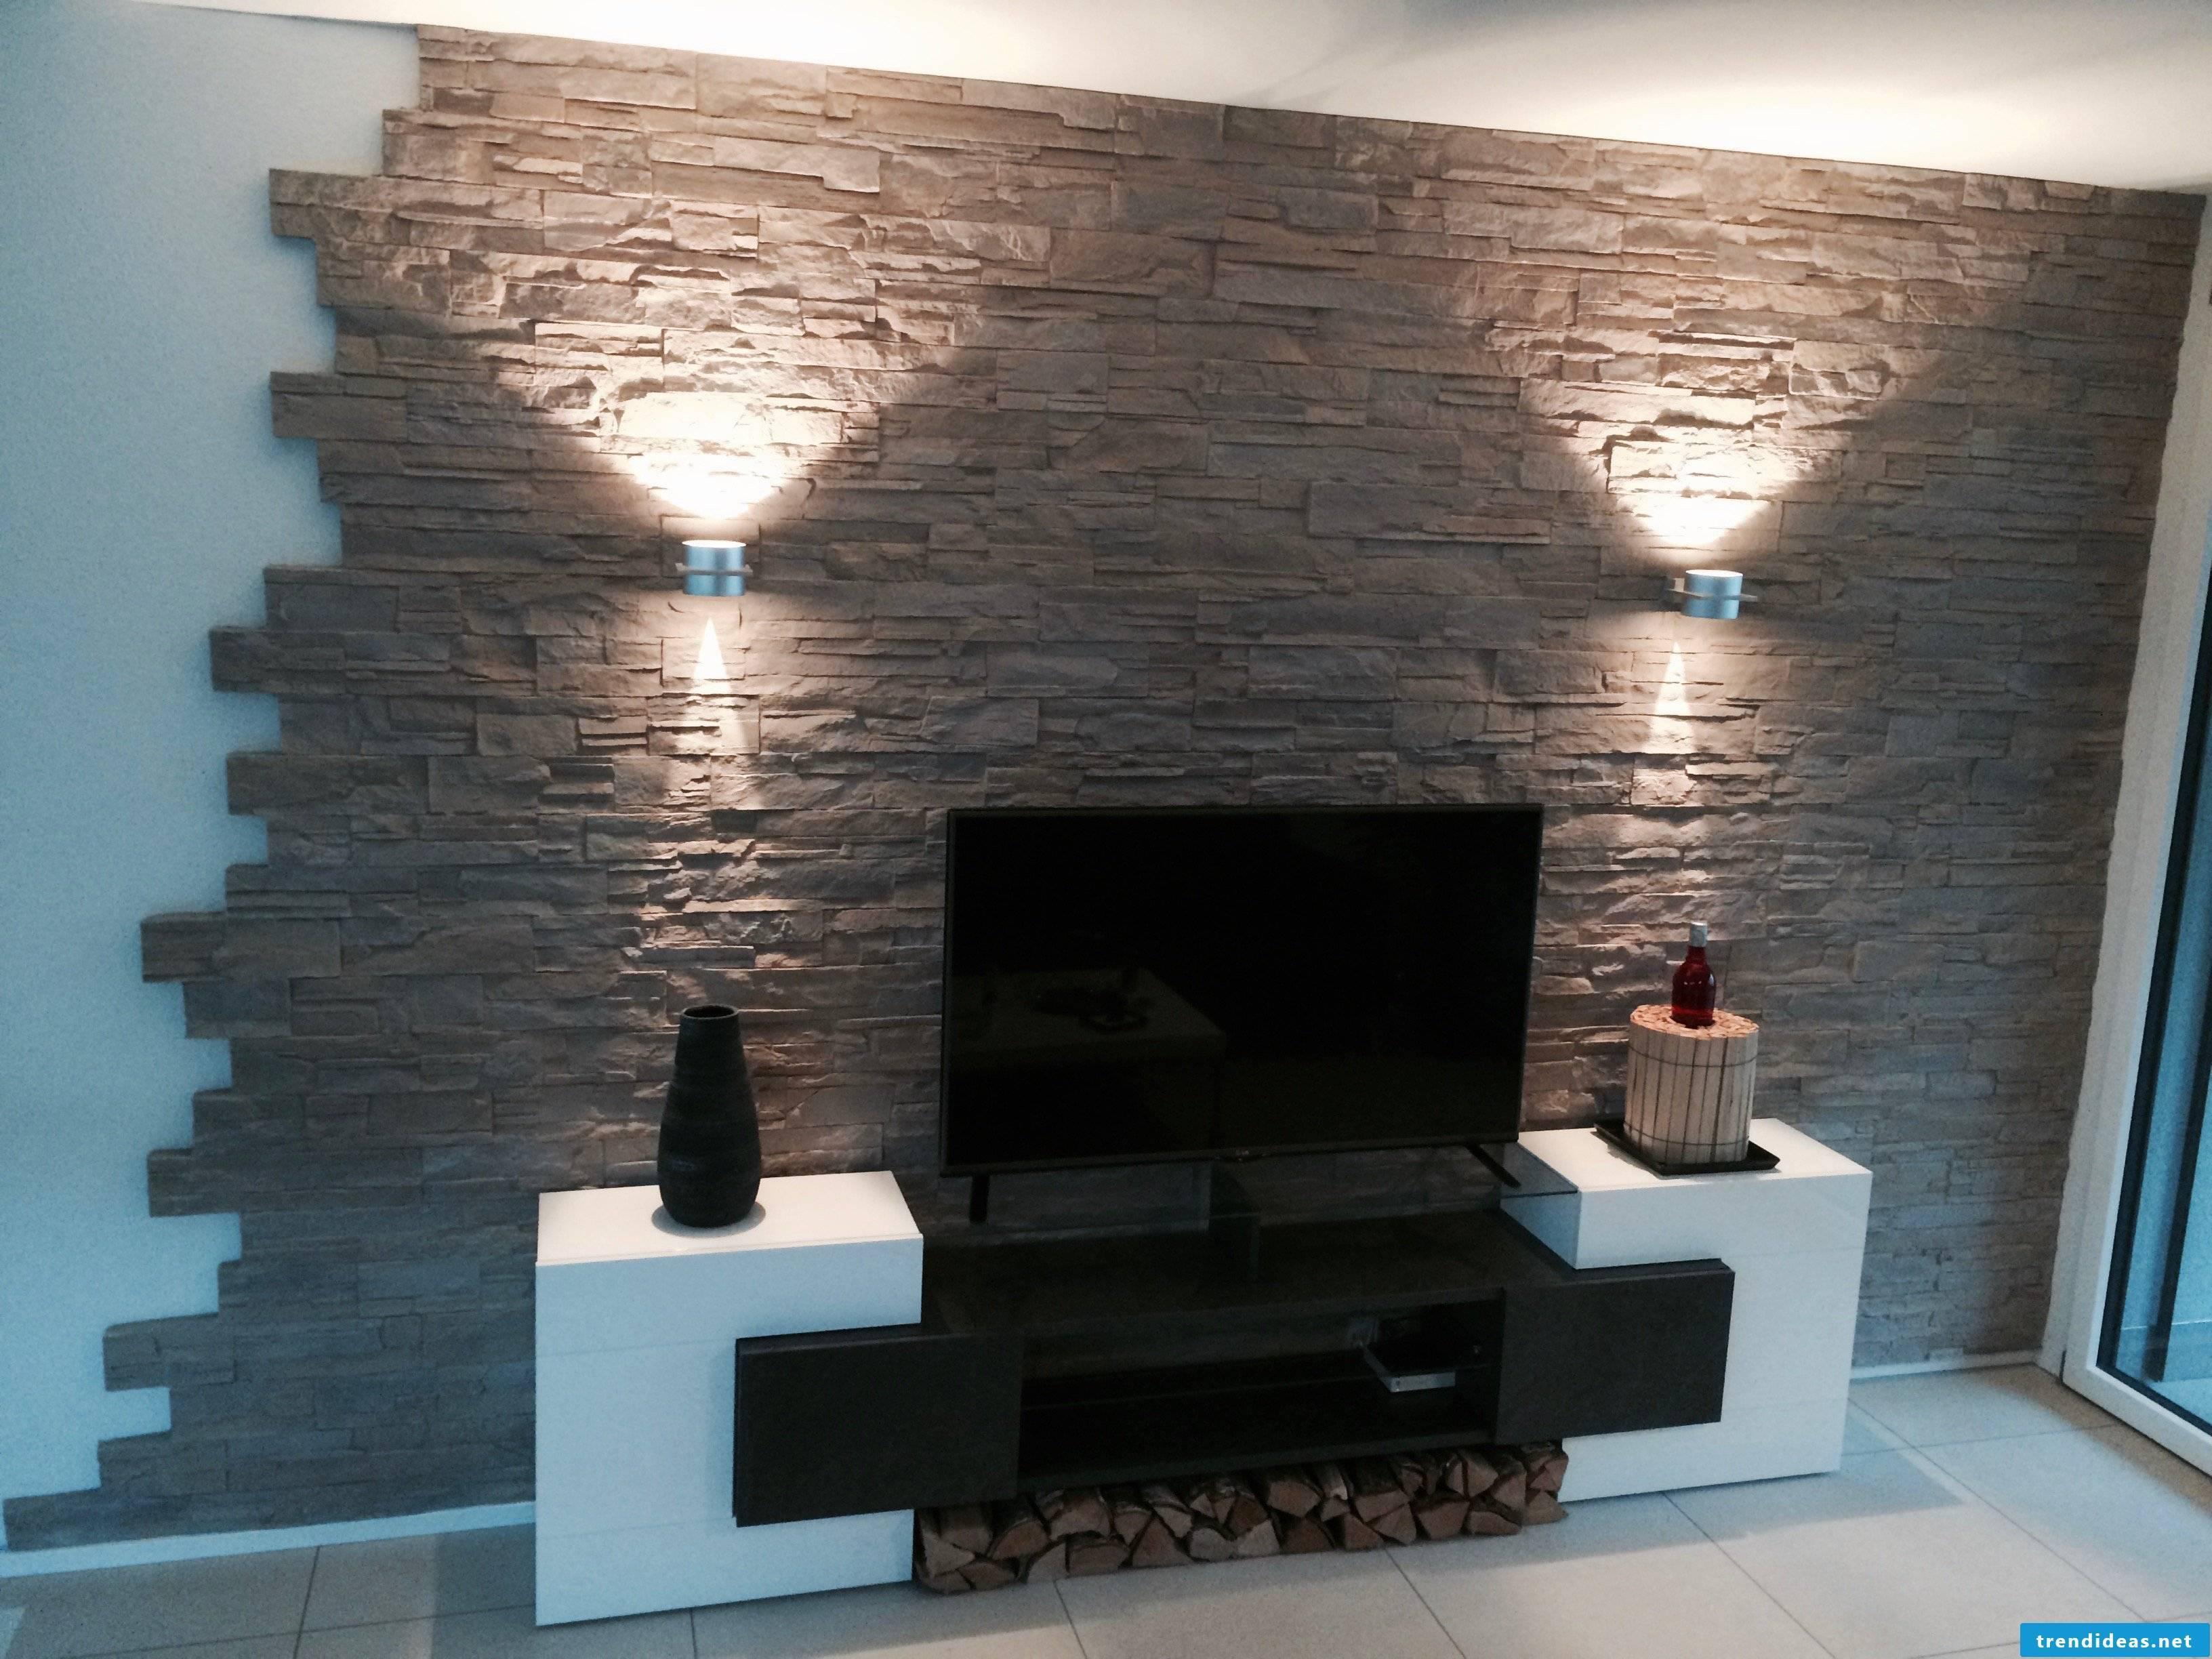 Illuminated decorative wall with stone cladding